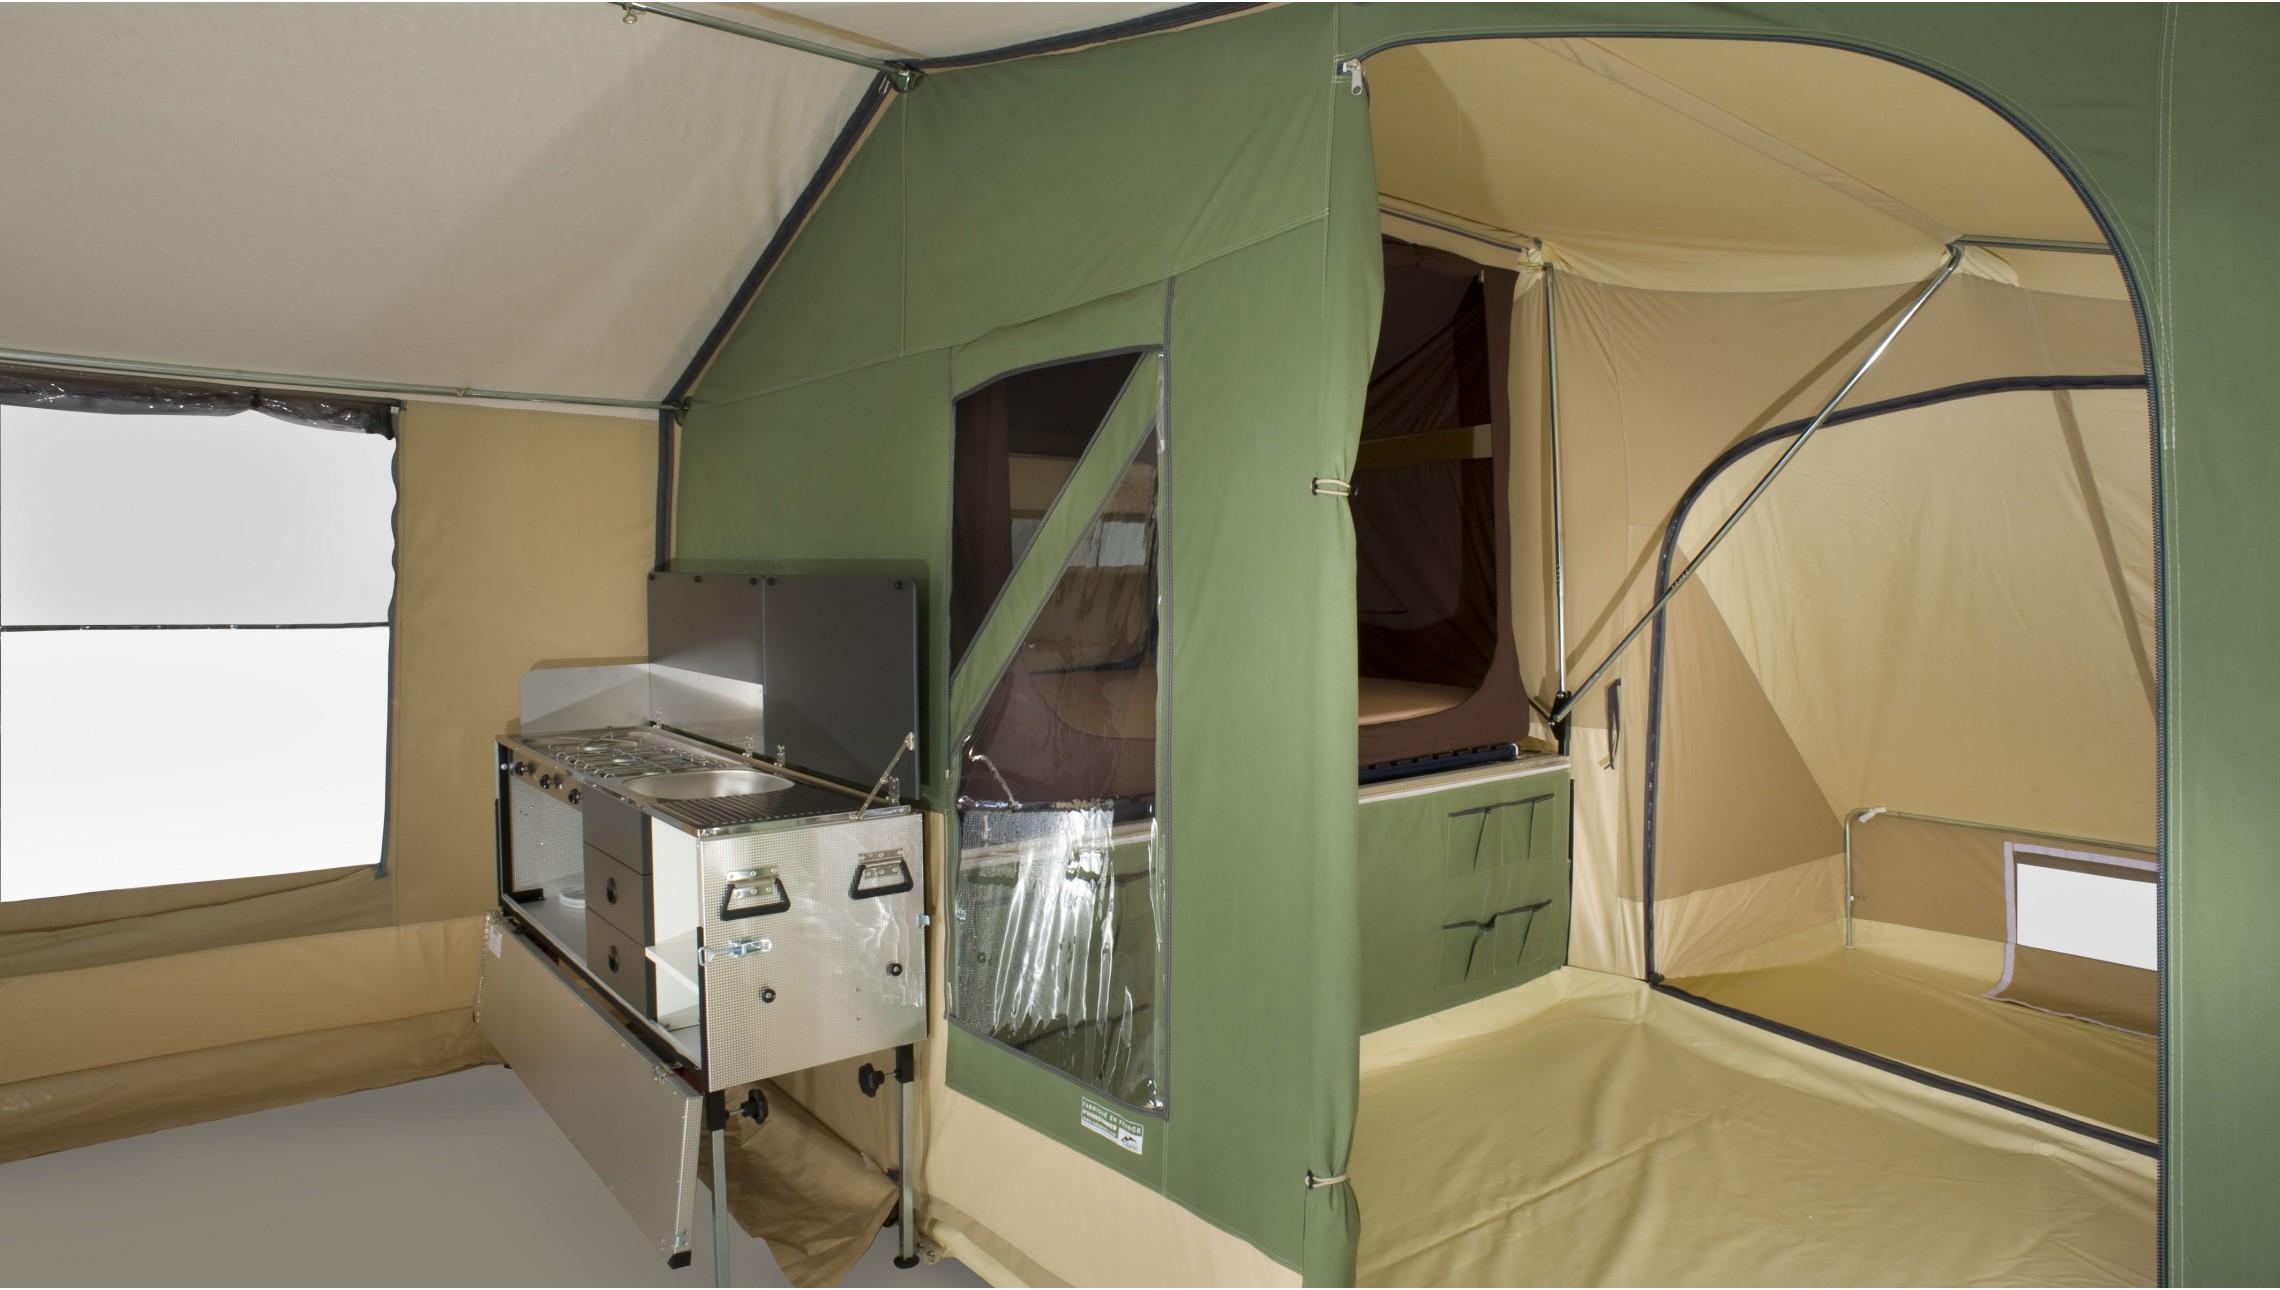 caravane pliante 6 places u car 33. Black Bedroom Furniture Sets. Home Design Ideas